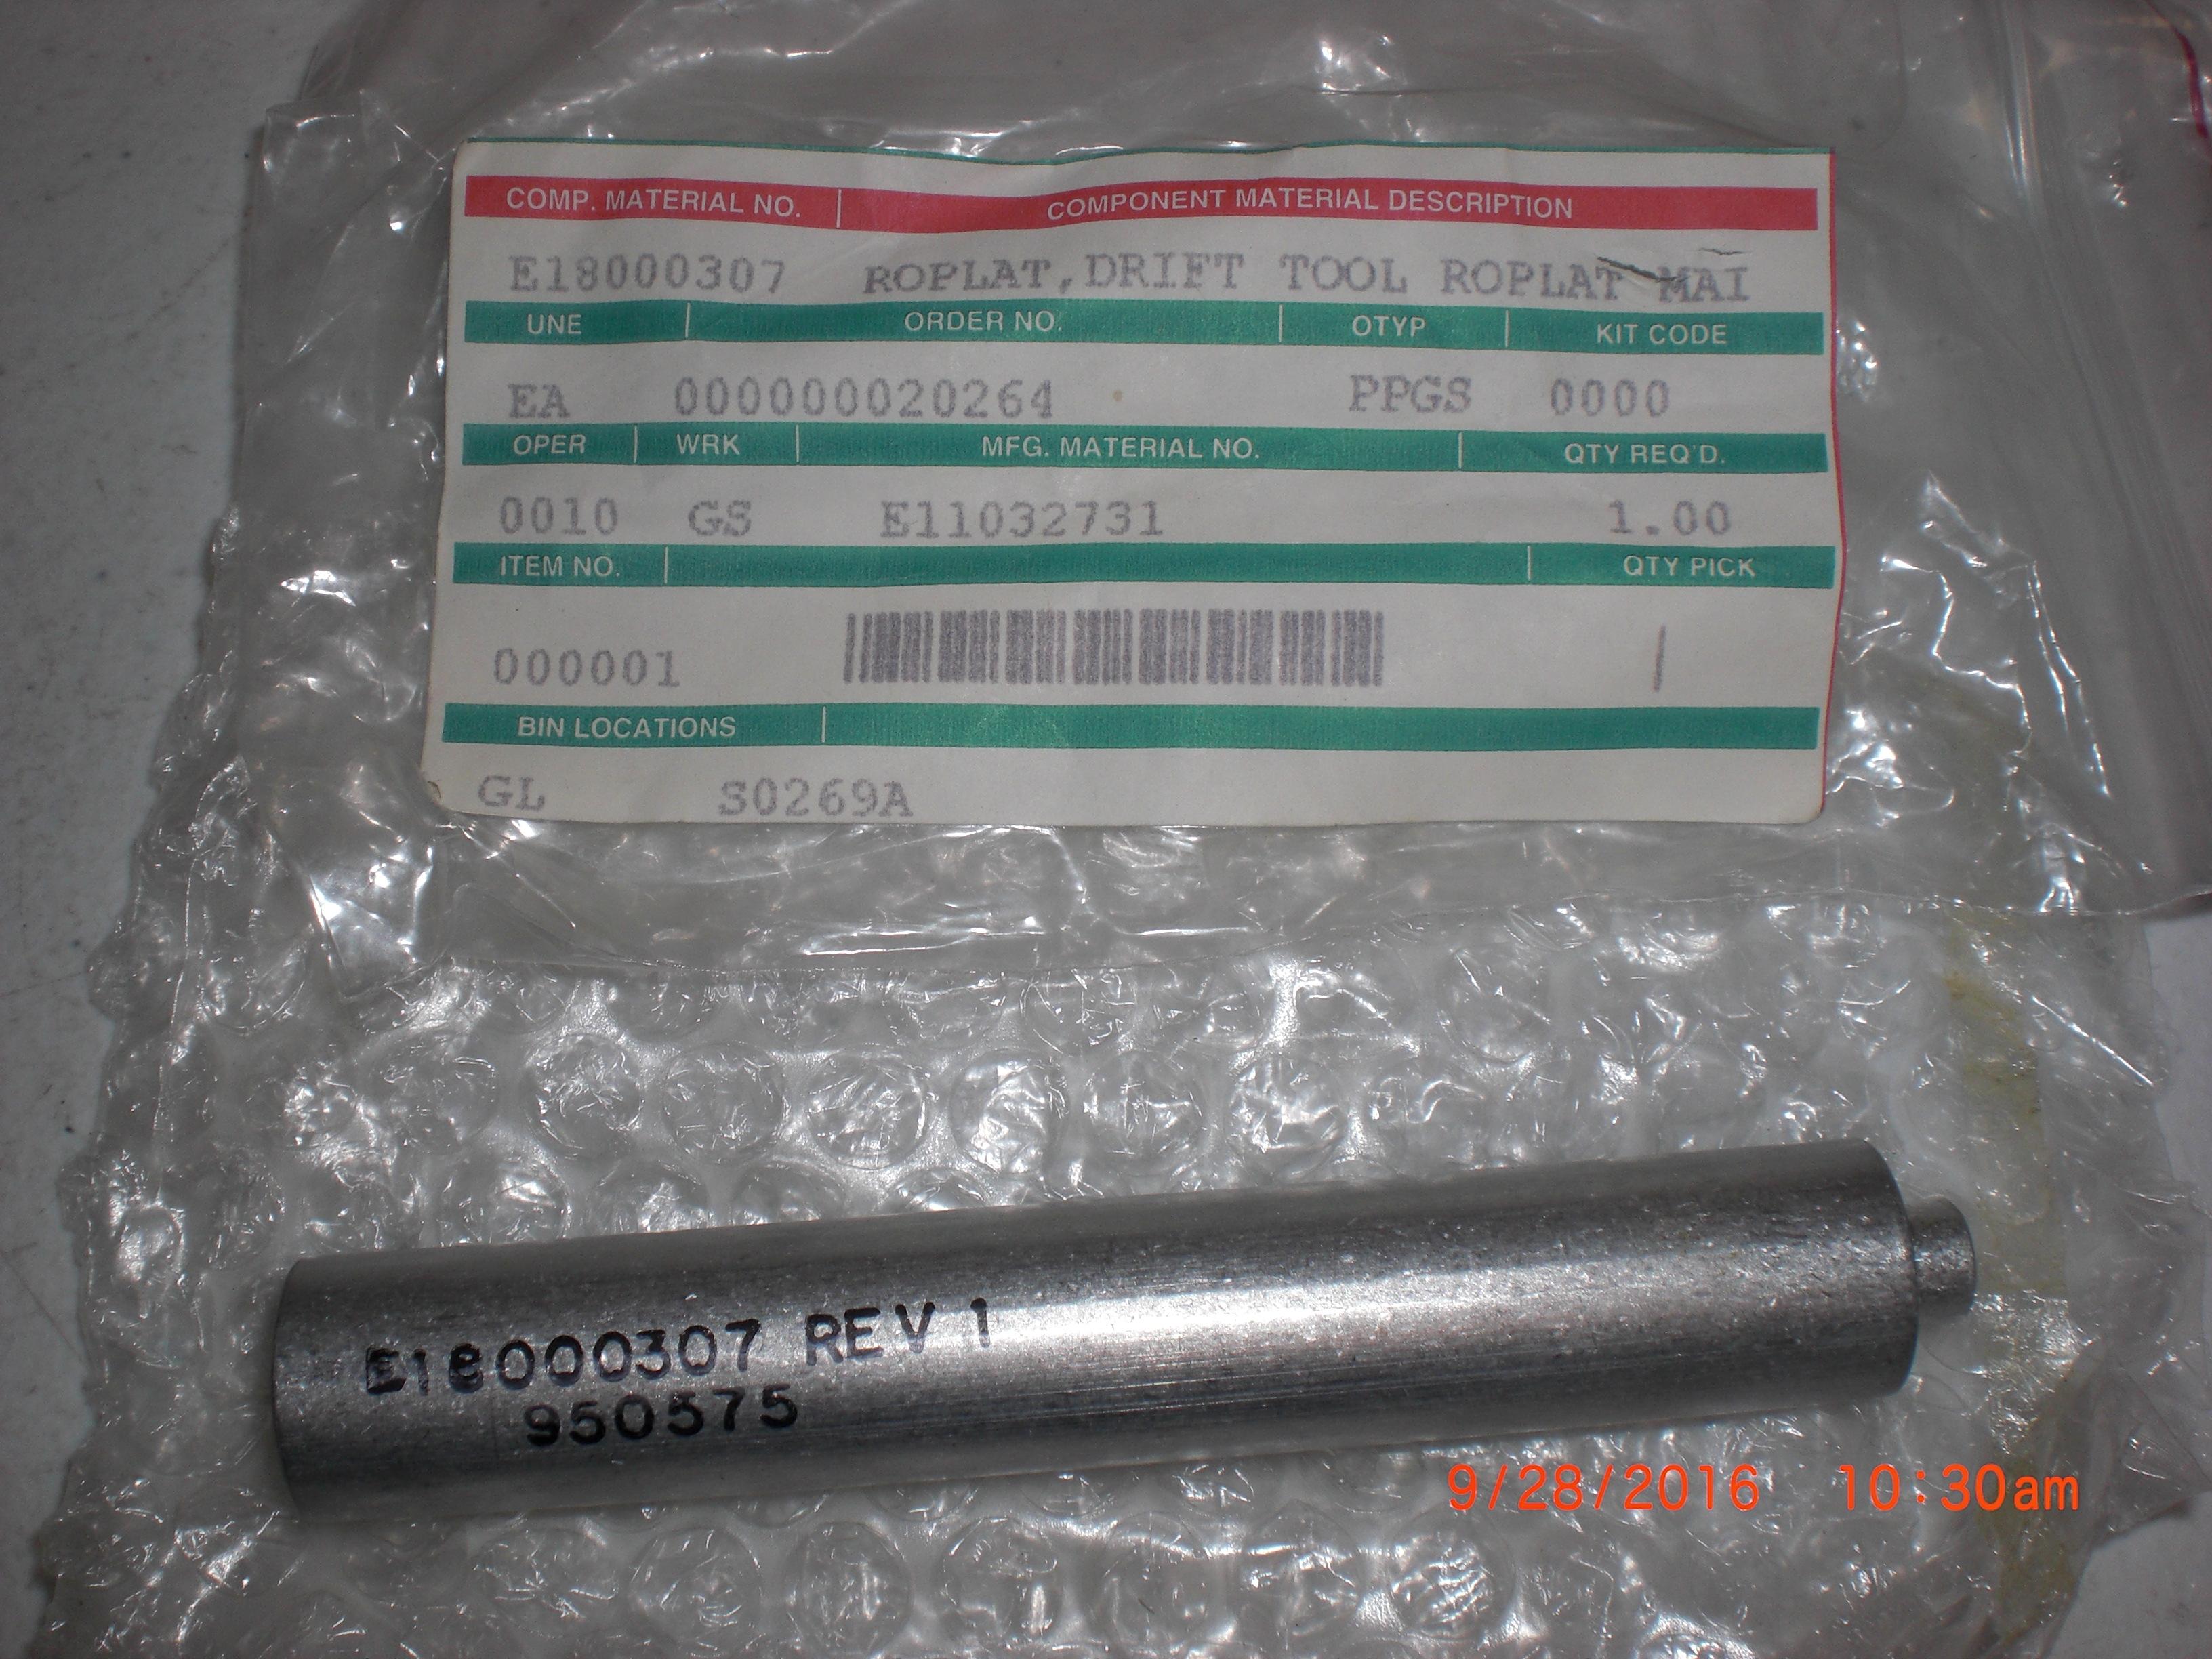 Tool VARIAN E18000307 ROPLAT Drift  E11032731